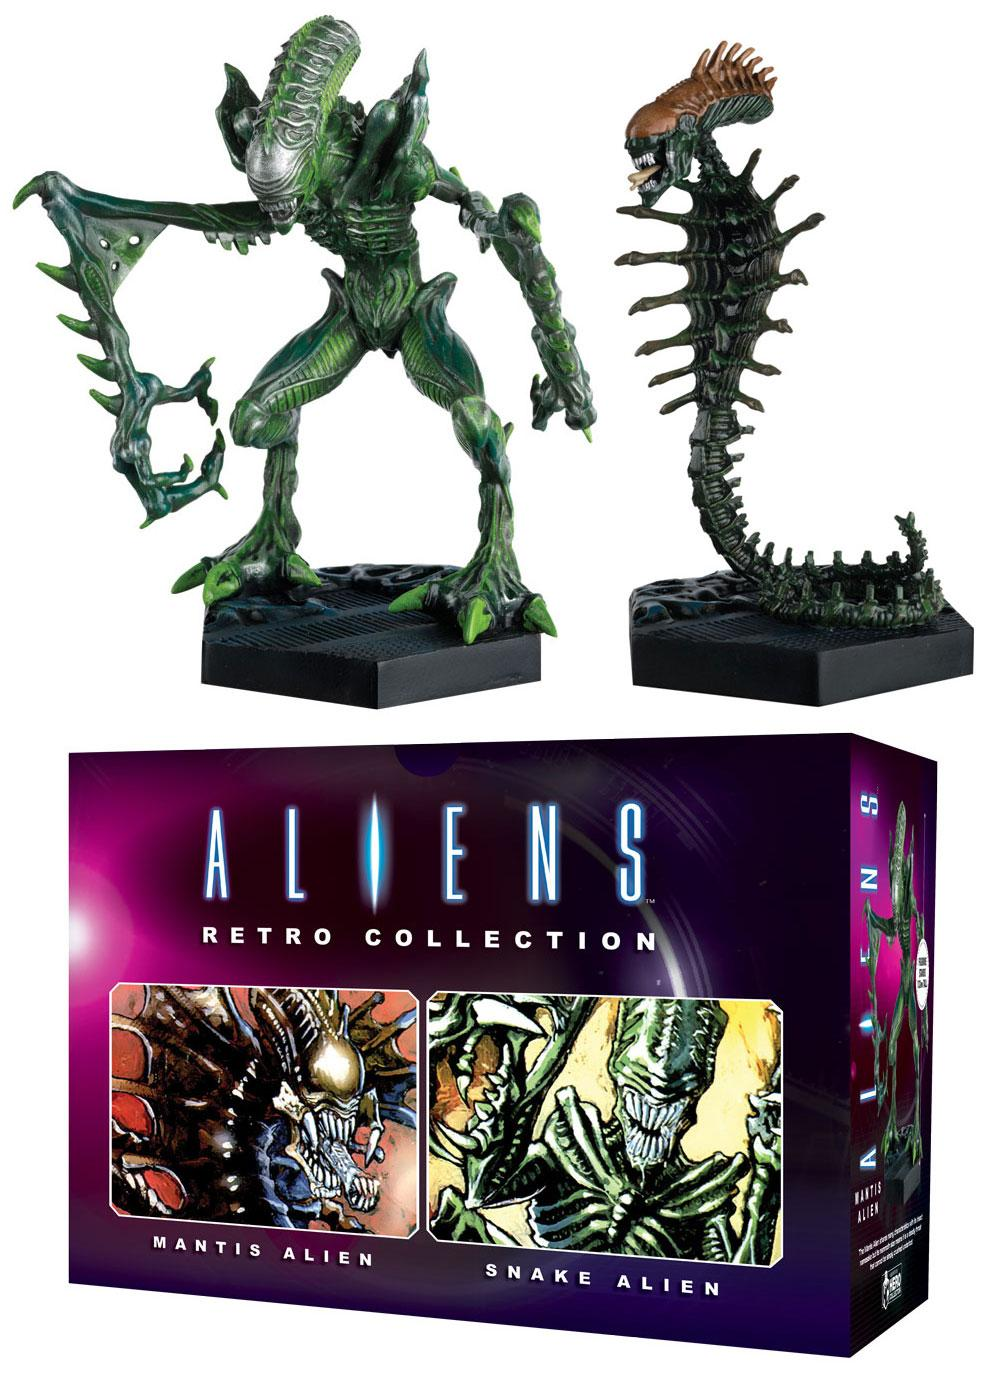 Aliens Retro Collection Figure 2-Pack Mantis Alien & Snake Alien 13 cm --- DAMAGED PACKAGING